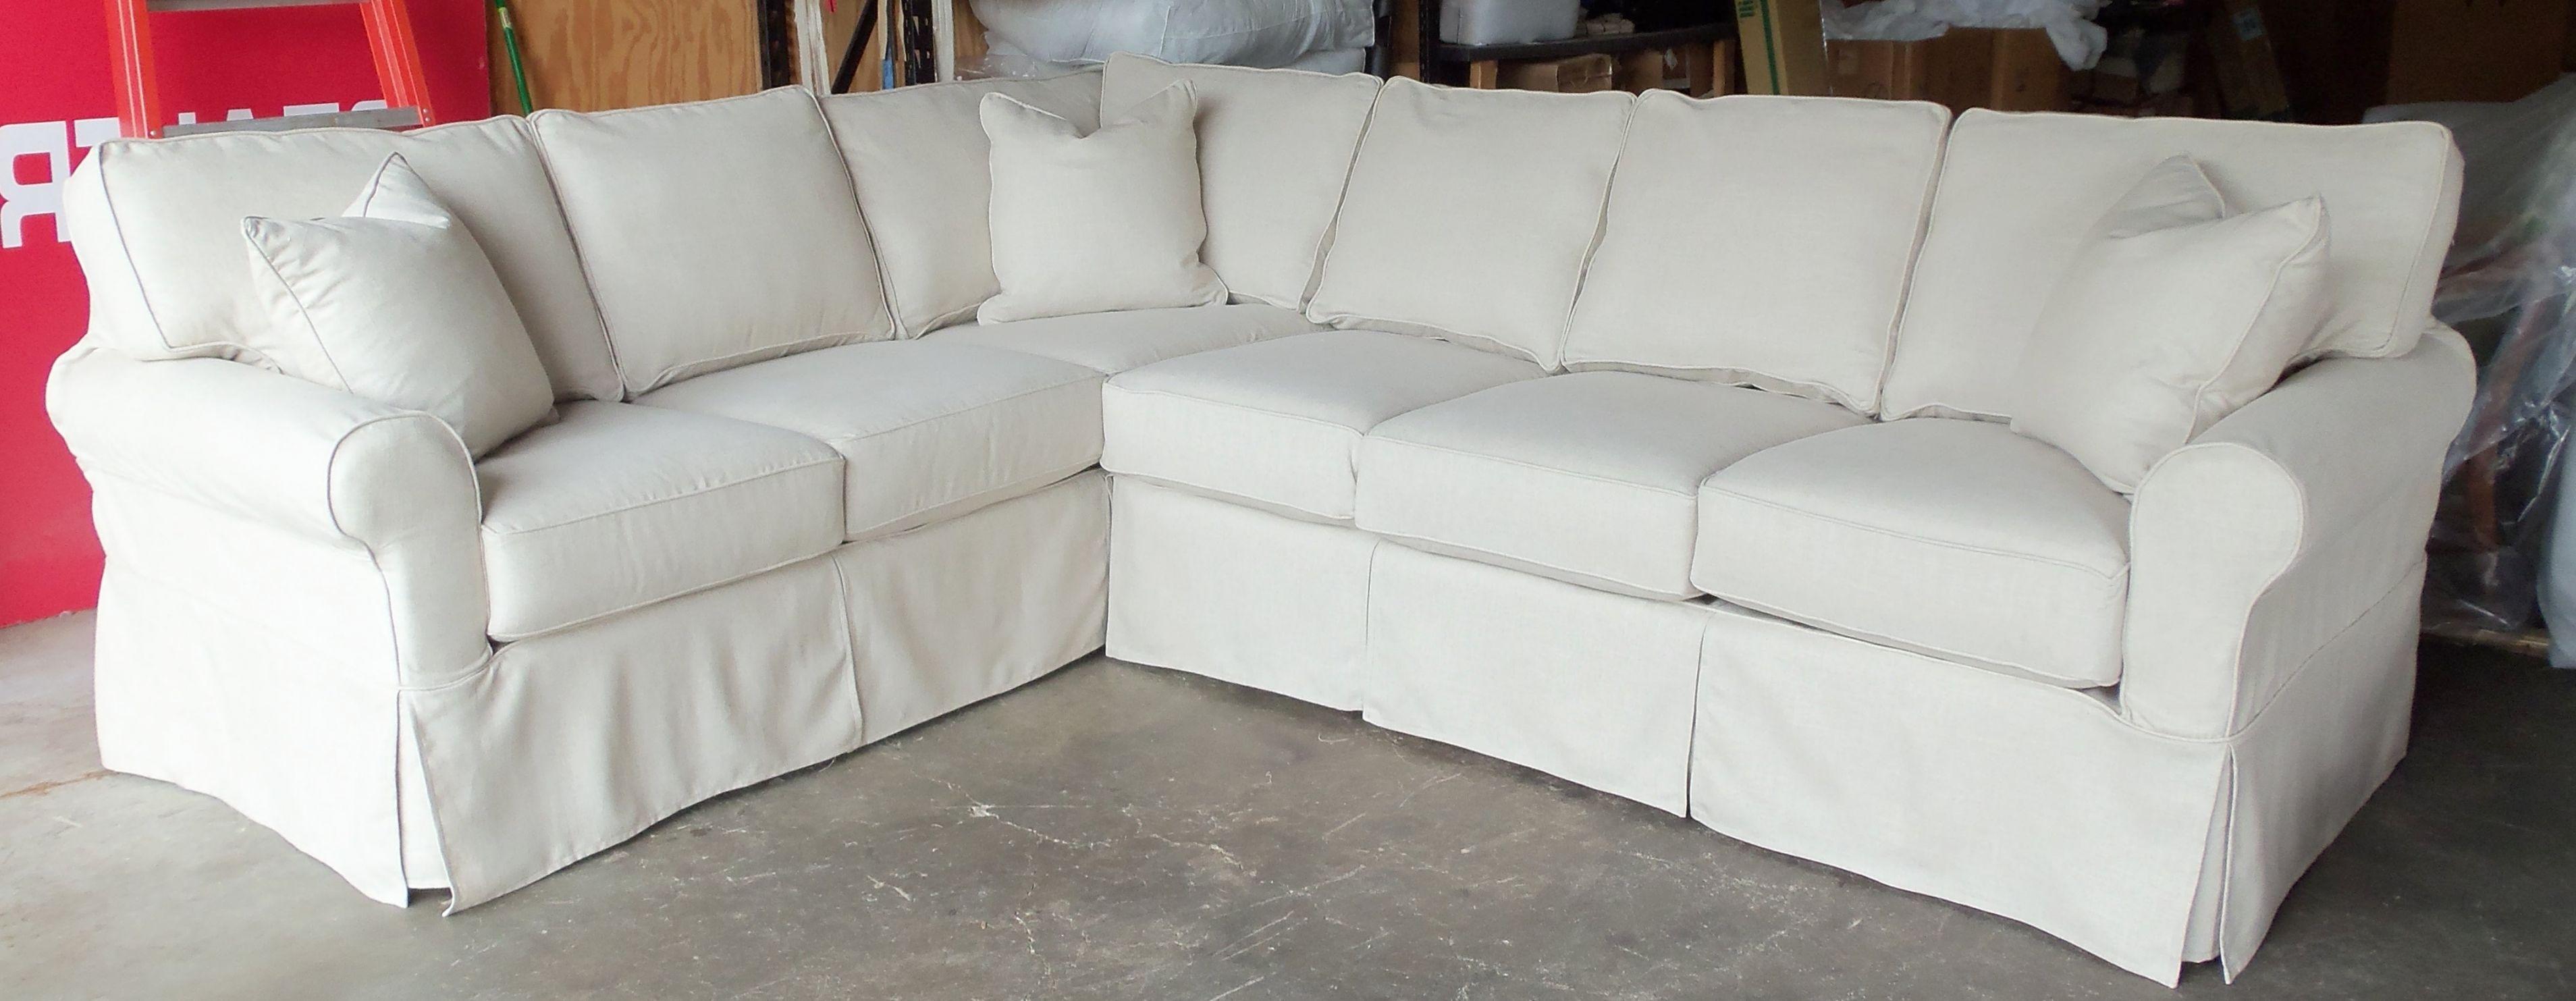 sofas birmingham u sofaer laeder 10 best ideas sectional at al sofa